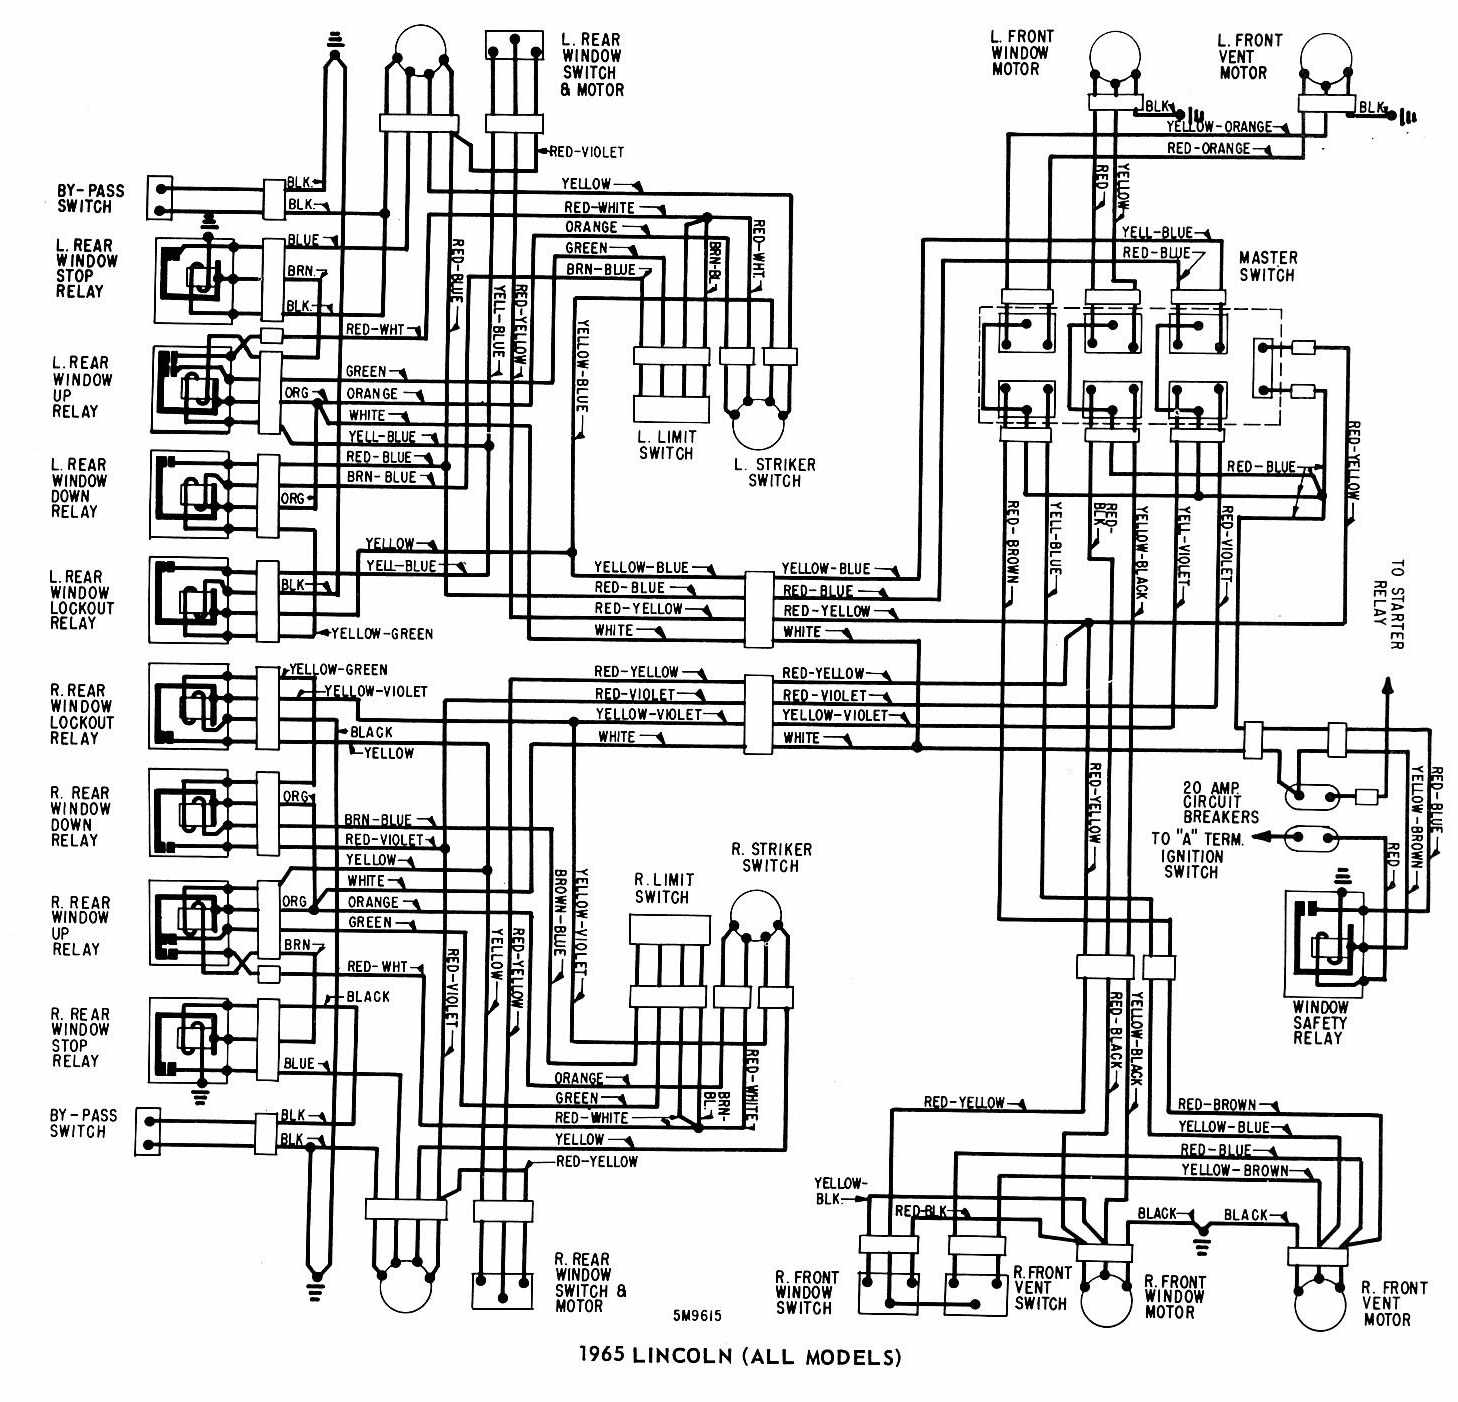 [DIAGRAM_0HG]  1953 Lincoln Wiring Diagram - 1998 Ford Expedition Parts Schematic for Wiring  Diagram Schematics | 1966 C10 Ignition Switch Wiring Diagram |  | Wiring Diagram Schematics